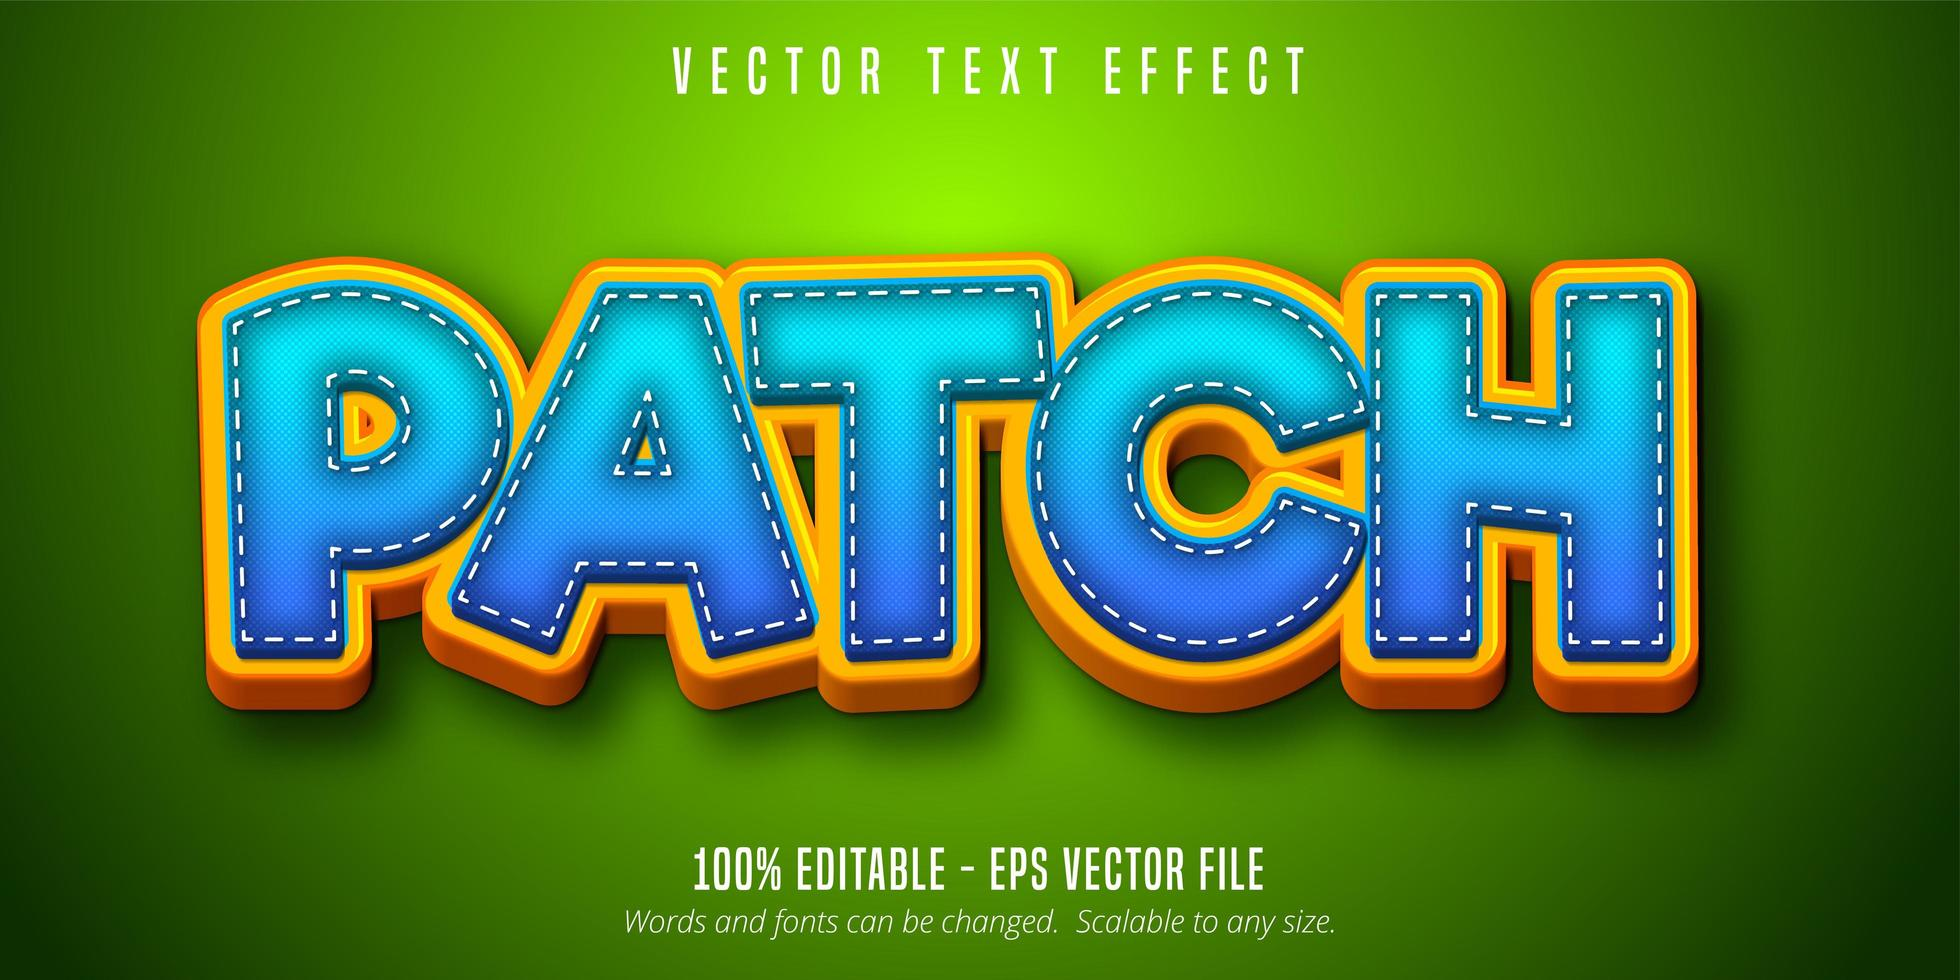 patch text, tecknad stil text effekt vektor